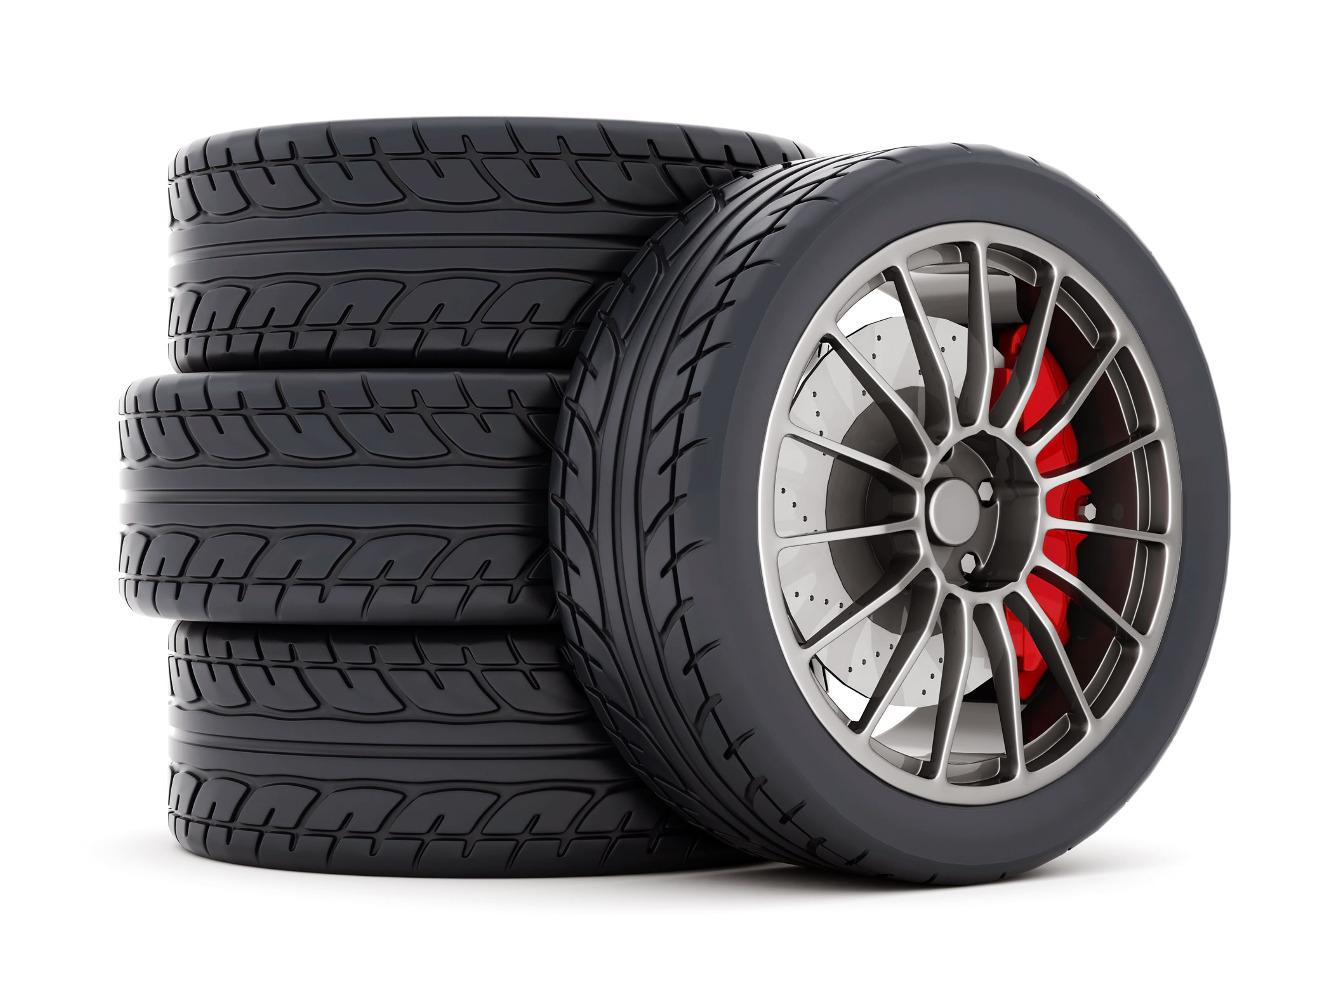 http://kolesospec.ru/tyres/kak-opredelit-na…nie-shiny-dunlop.html